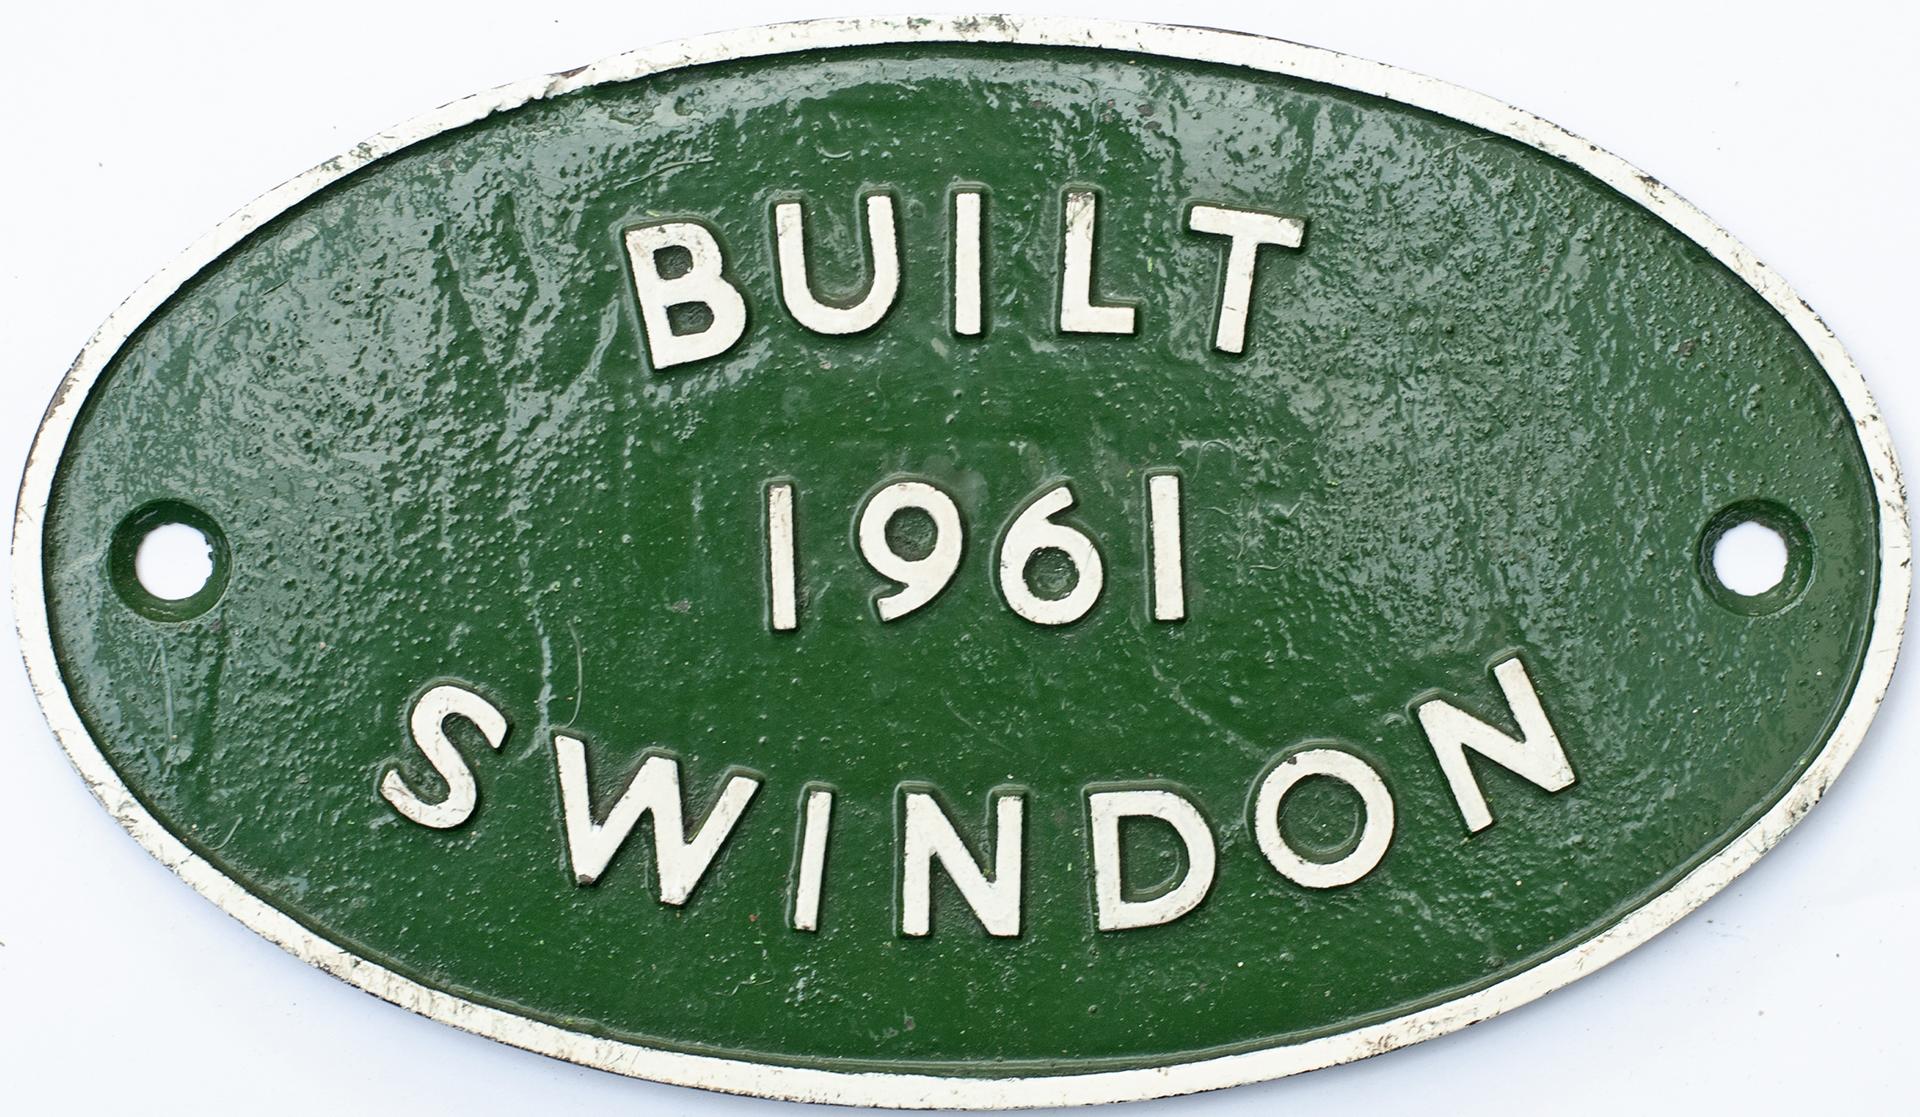 Worksplate BUILT 1961 SWINDON Ex BR Diesel Class